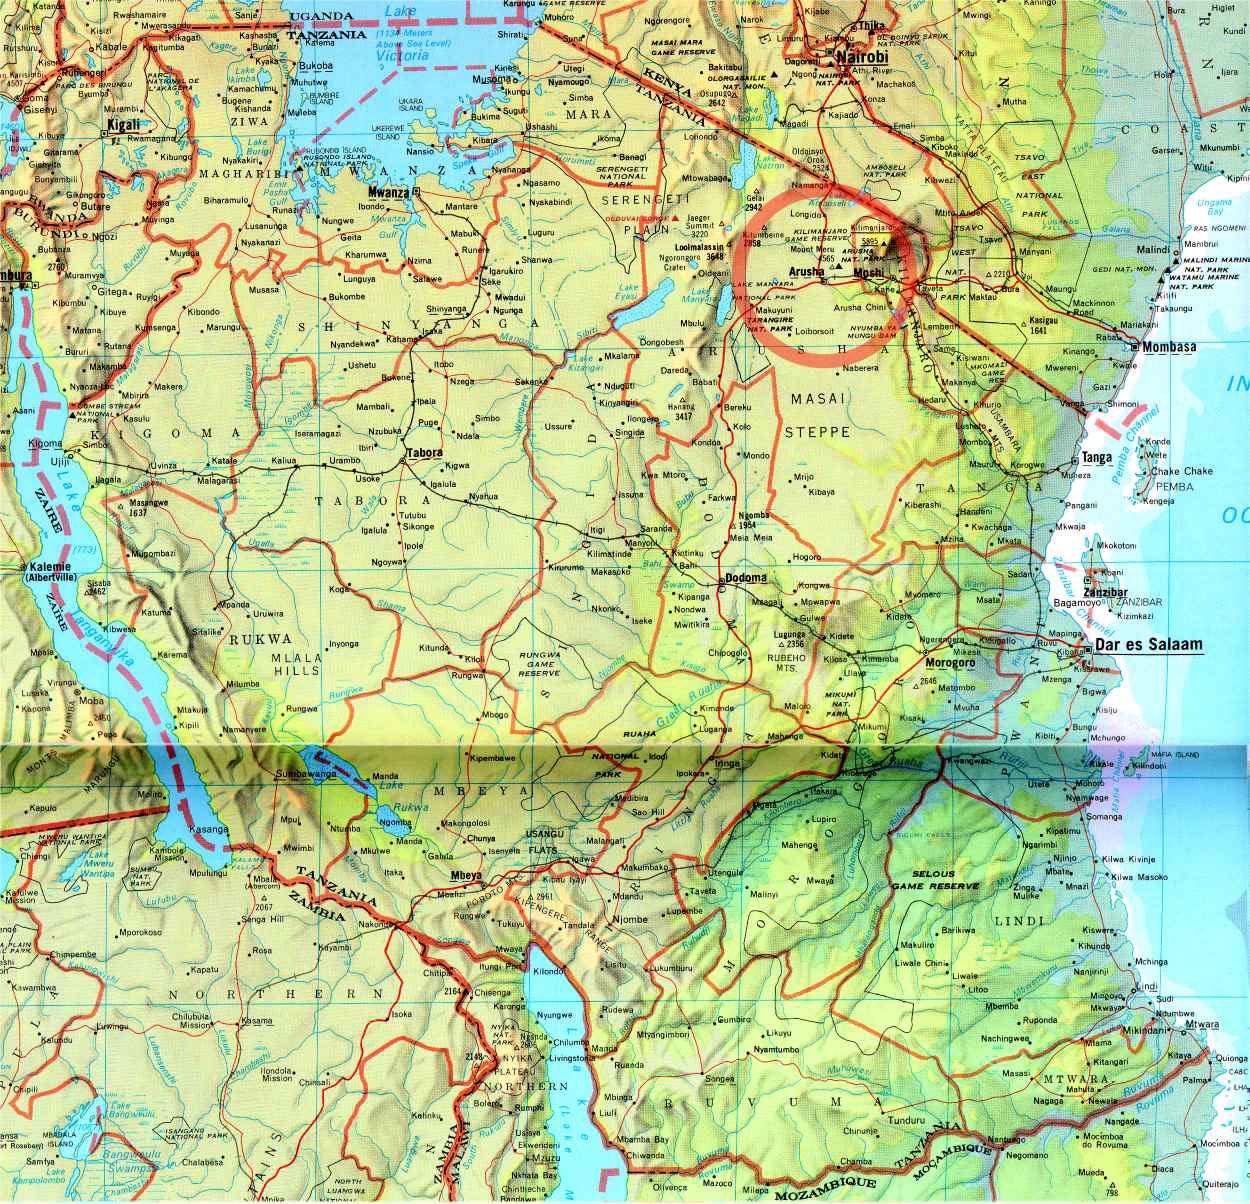 Grande carte Tanzanie, Grande carte de Tanzanie